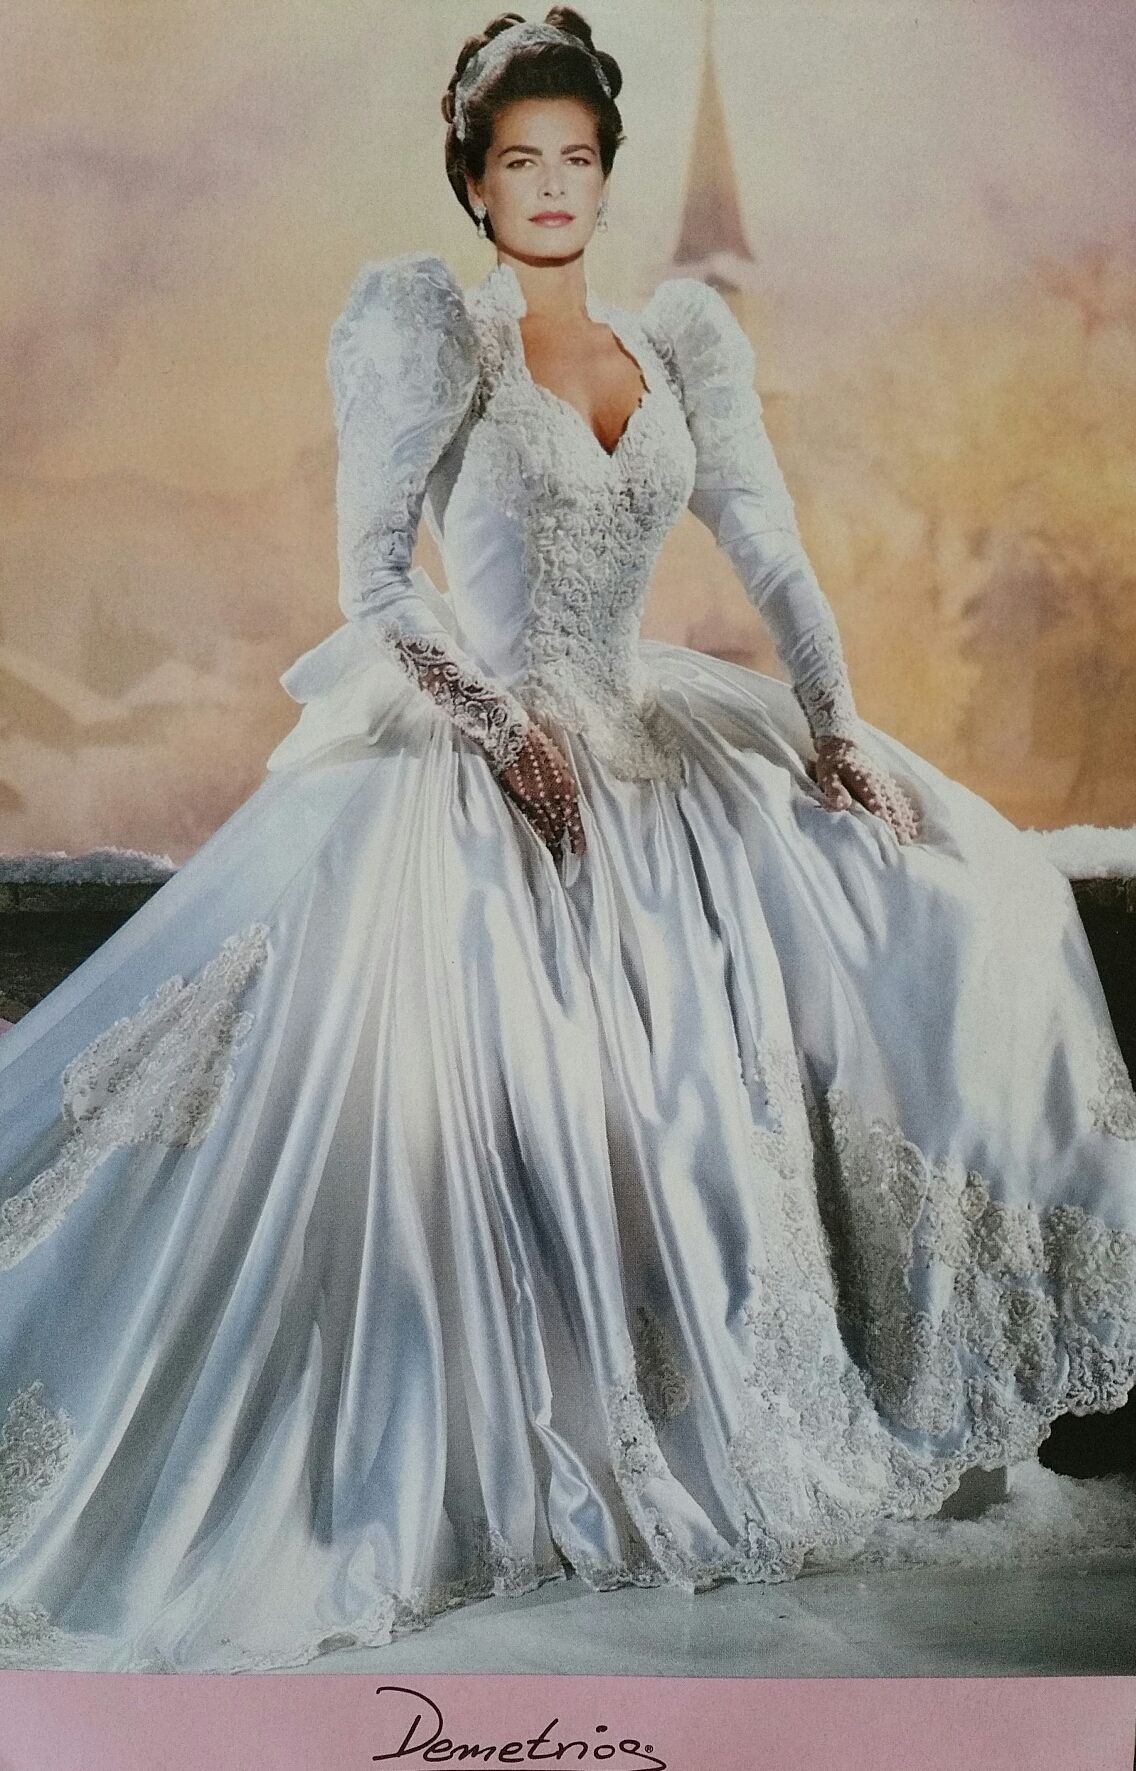 90s wedding dress, big shoulders and sleeves became a popular ...